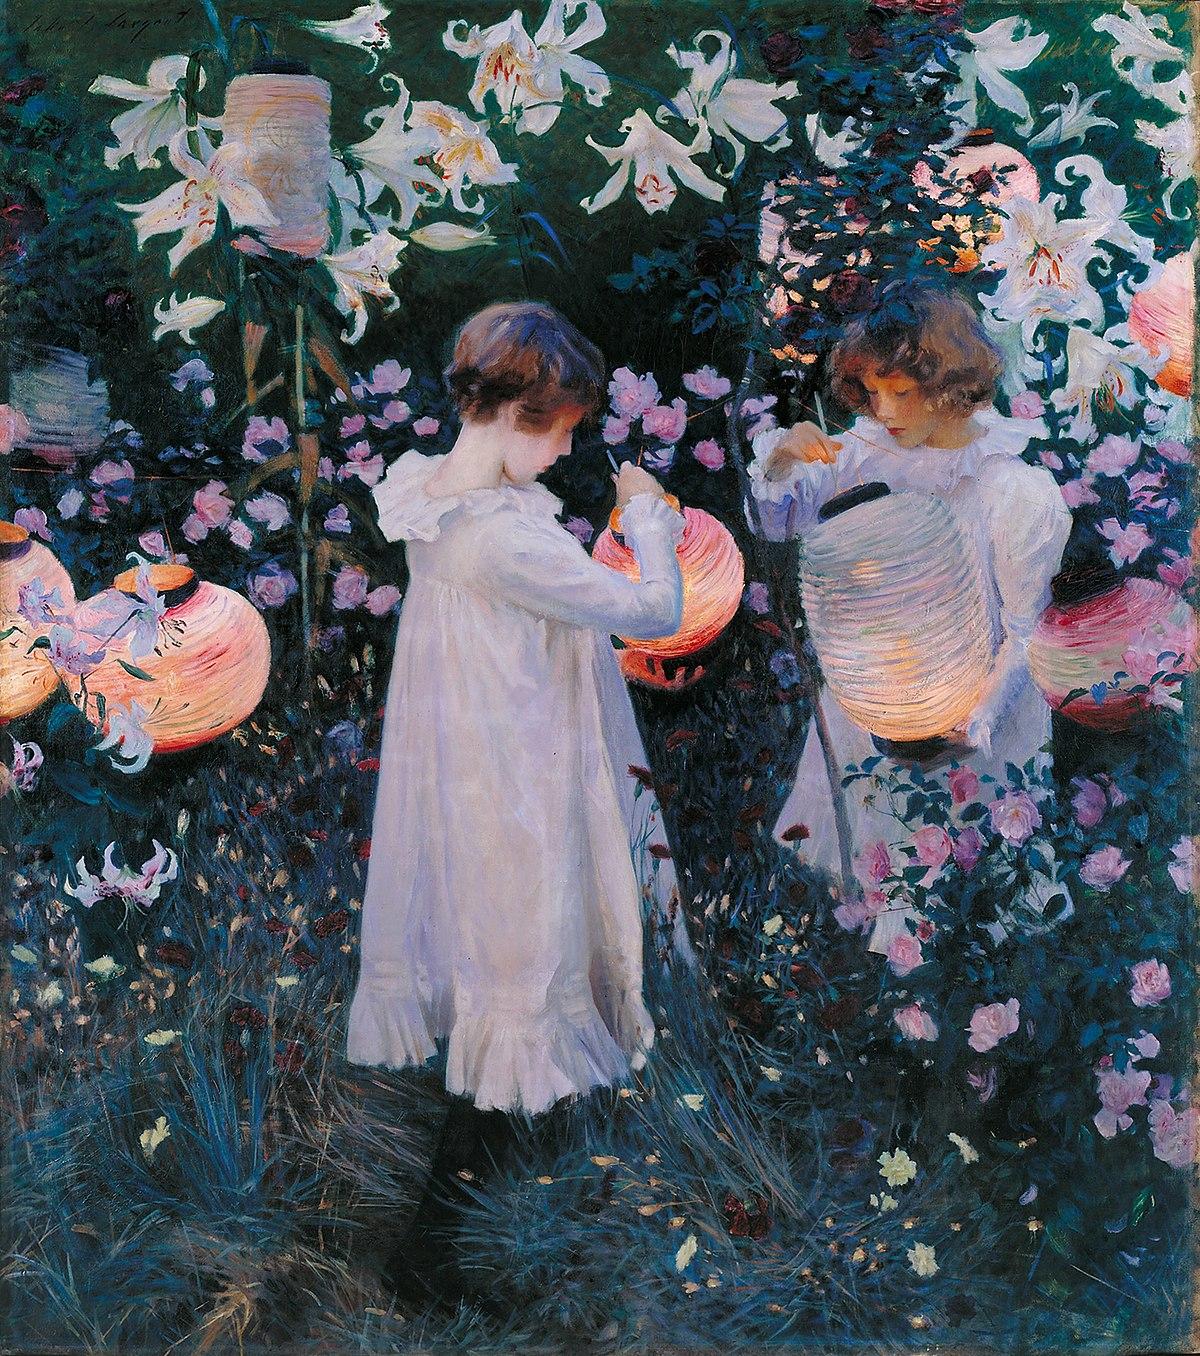 1200px-John_Singer_Sargent_-_Carnation%2C_Lily%2C_Lily%2C_Rose_-_Google_Art_Project.jpg